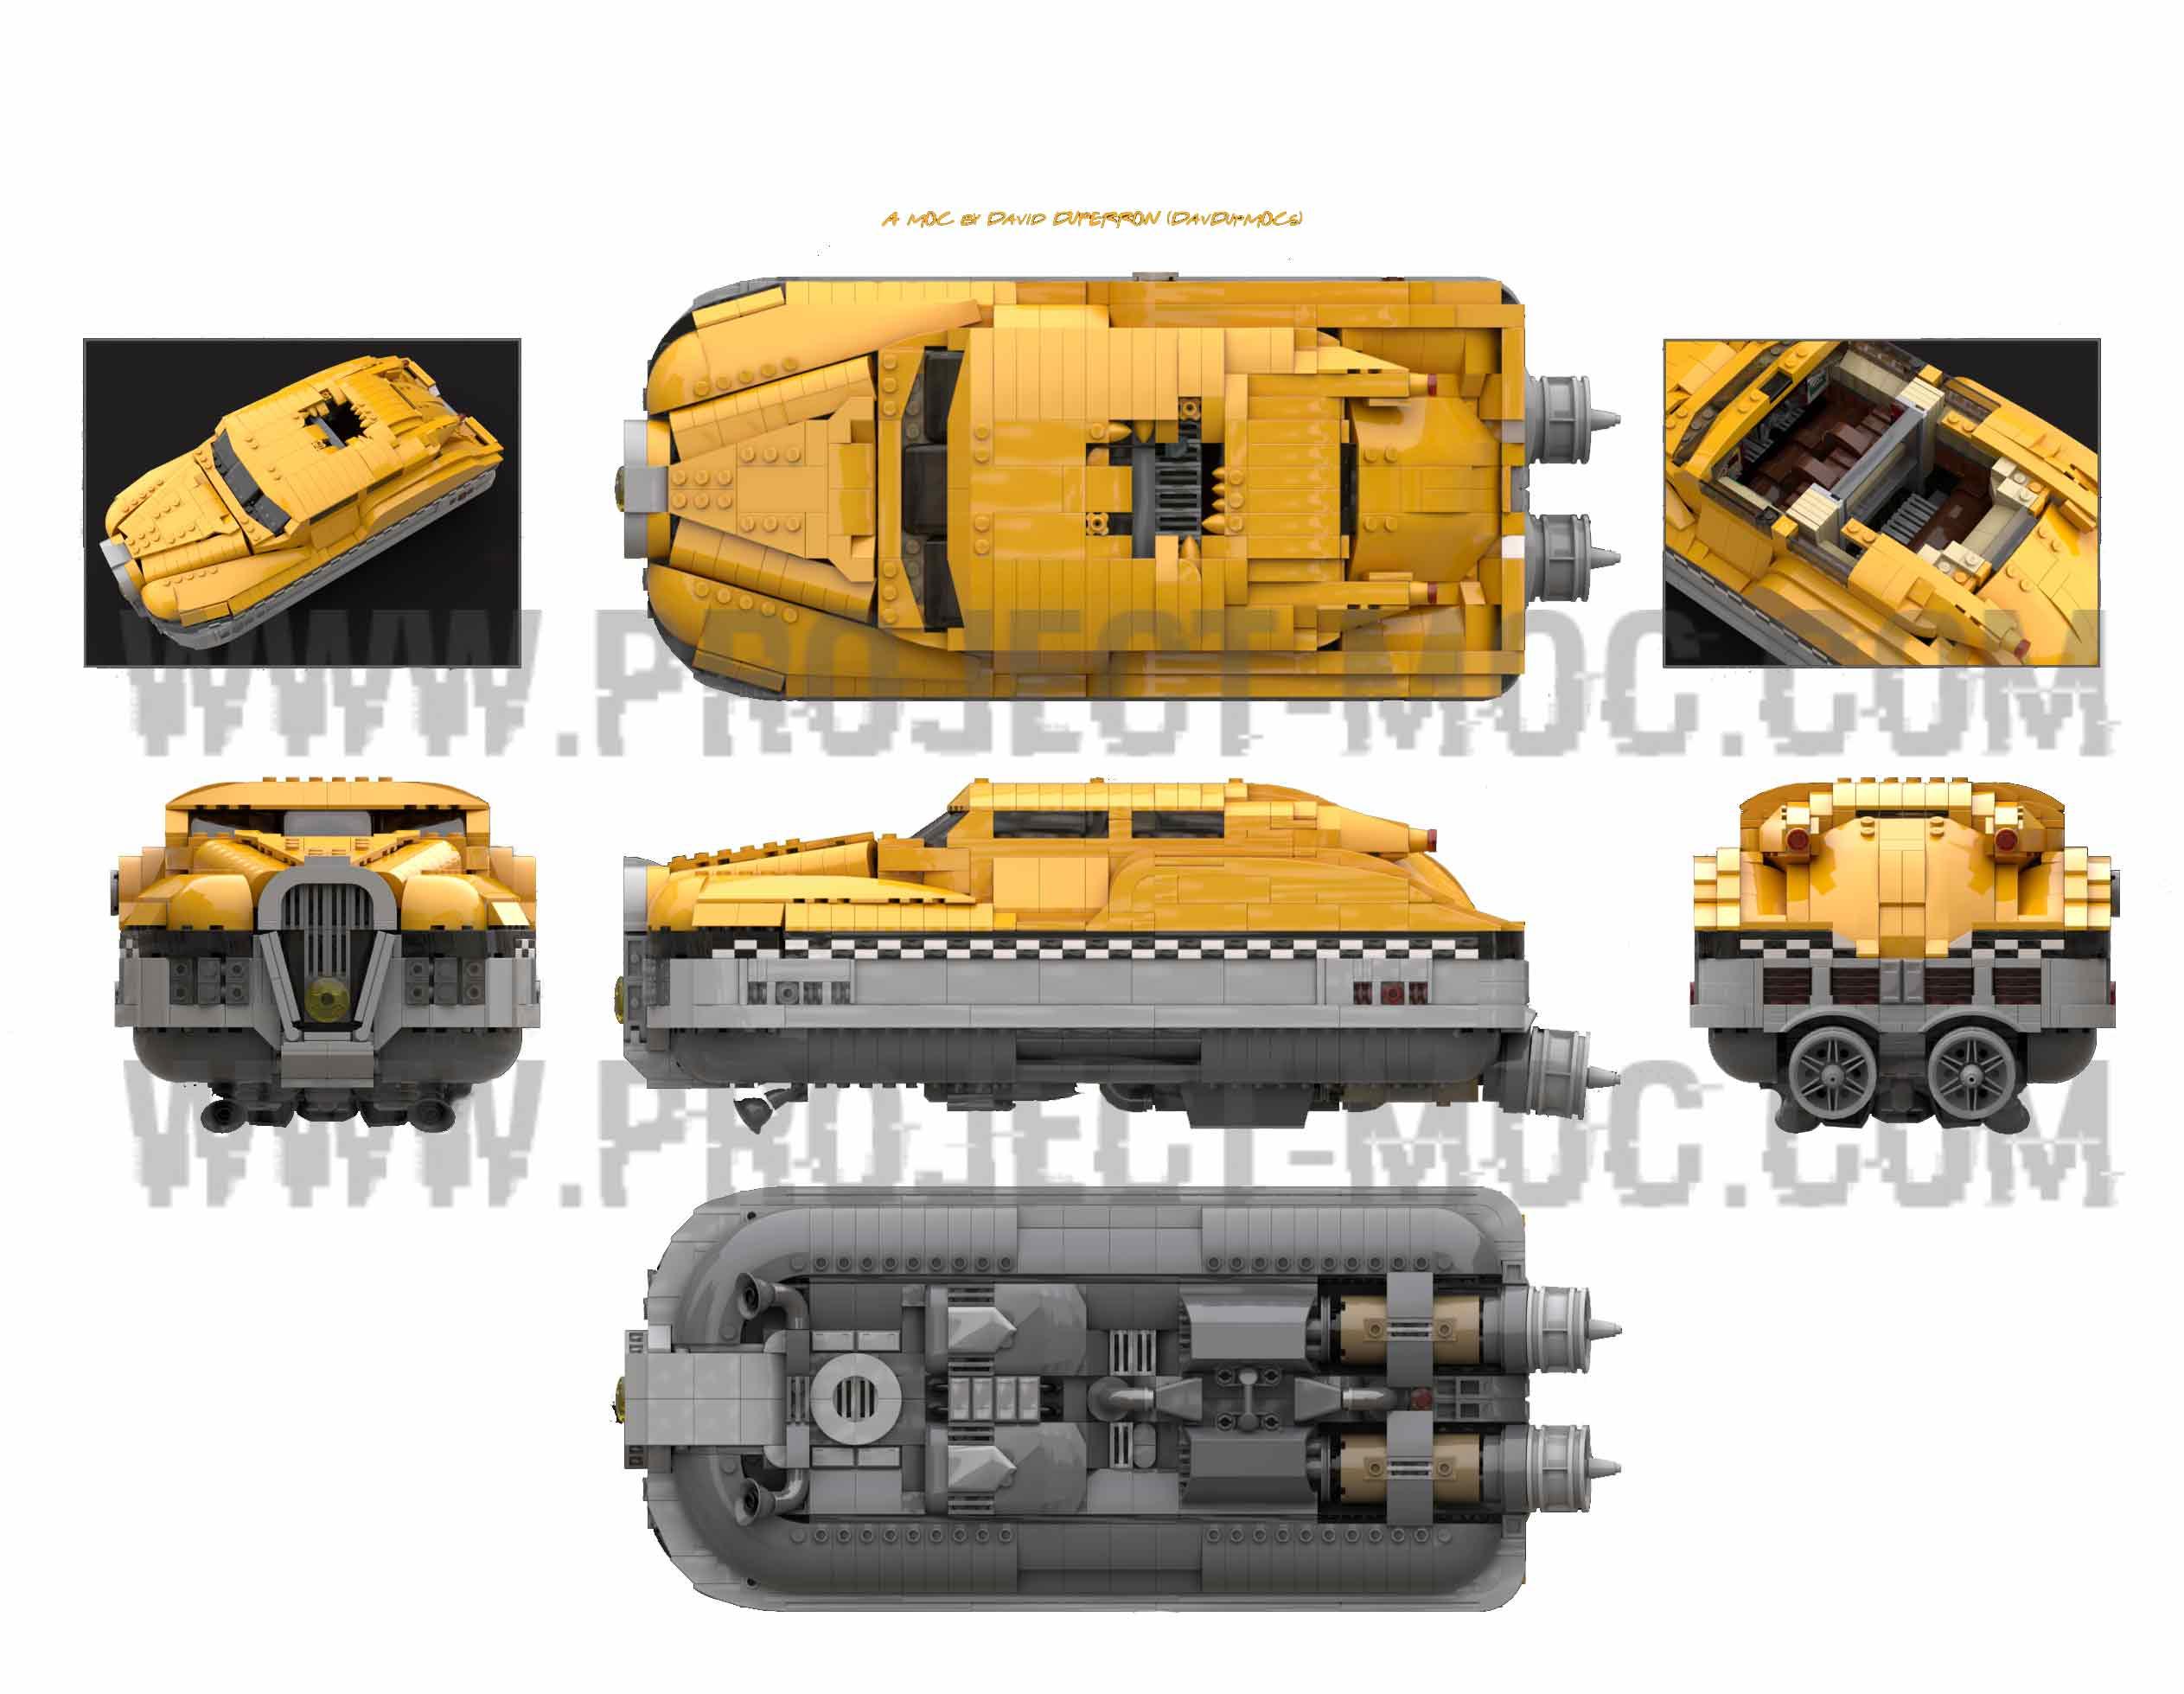 MOC - 5th Element Taxi #PM-000011